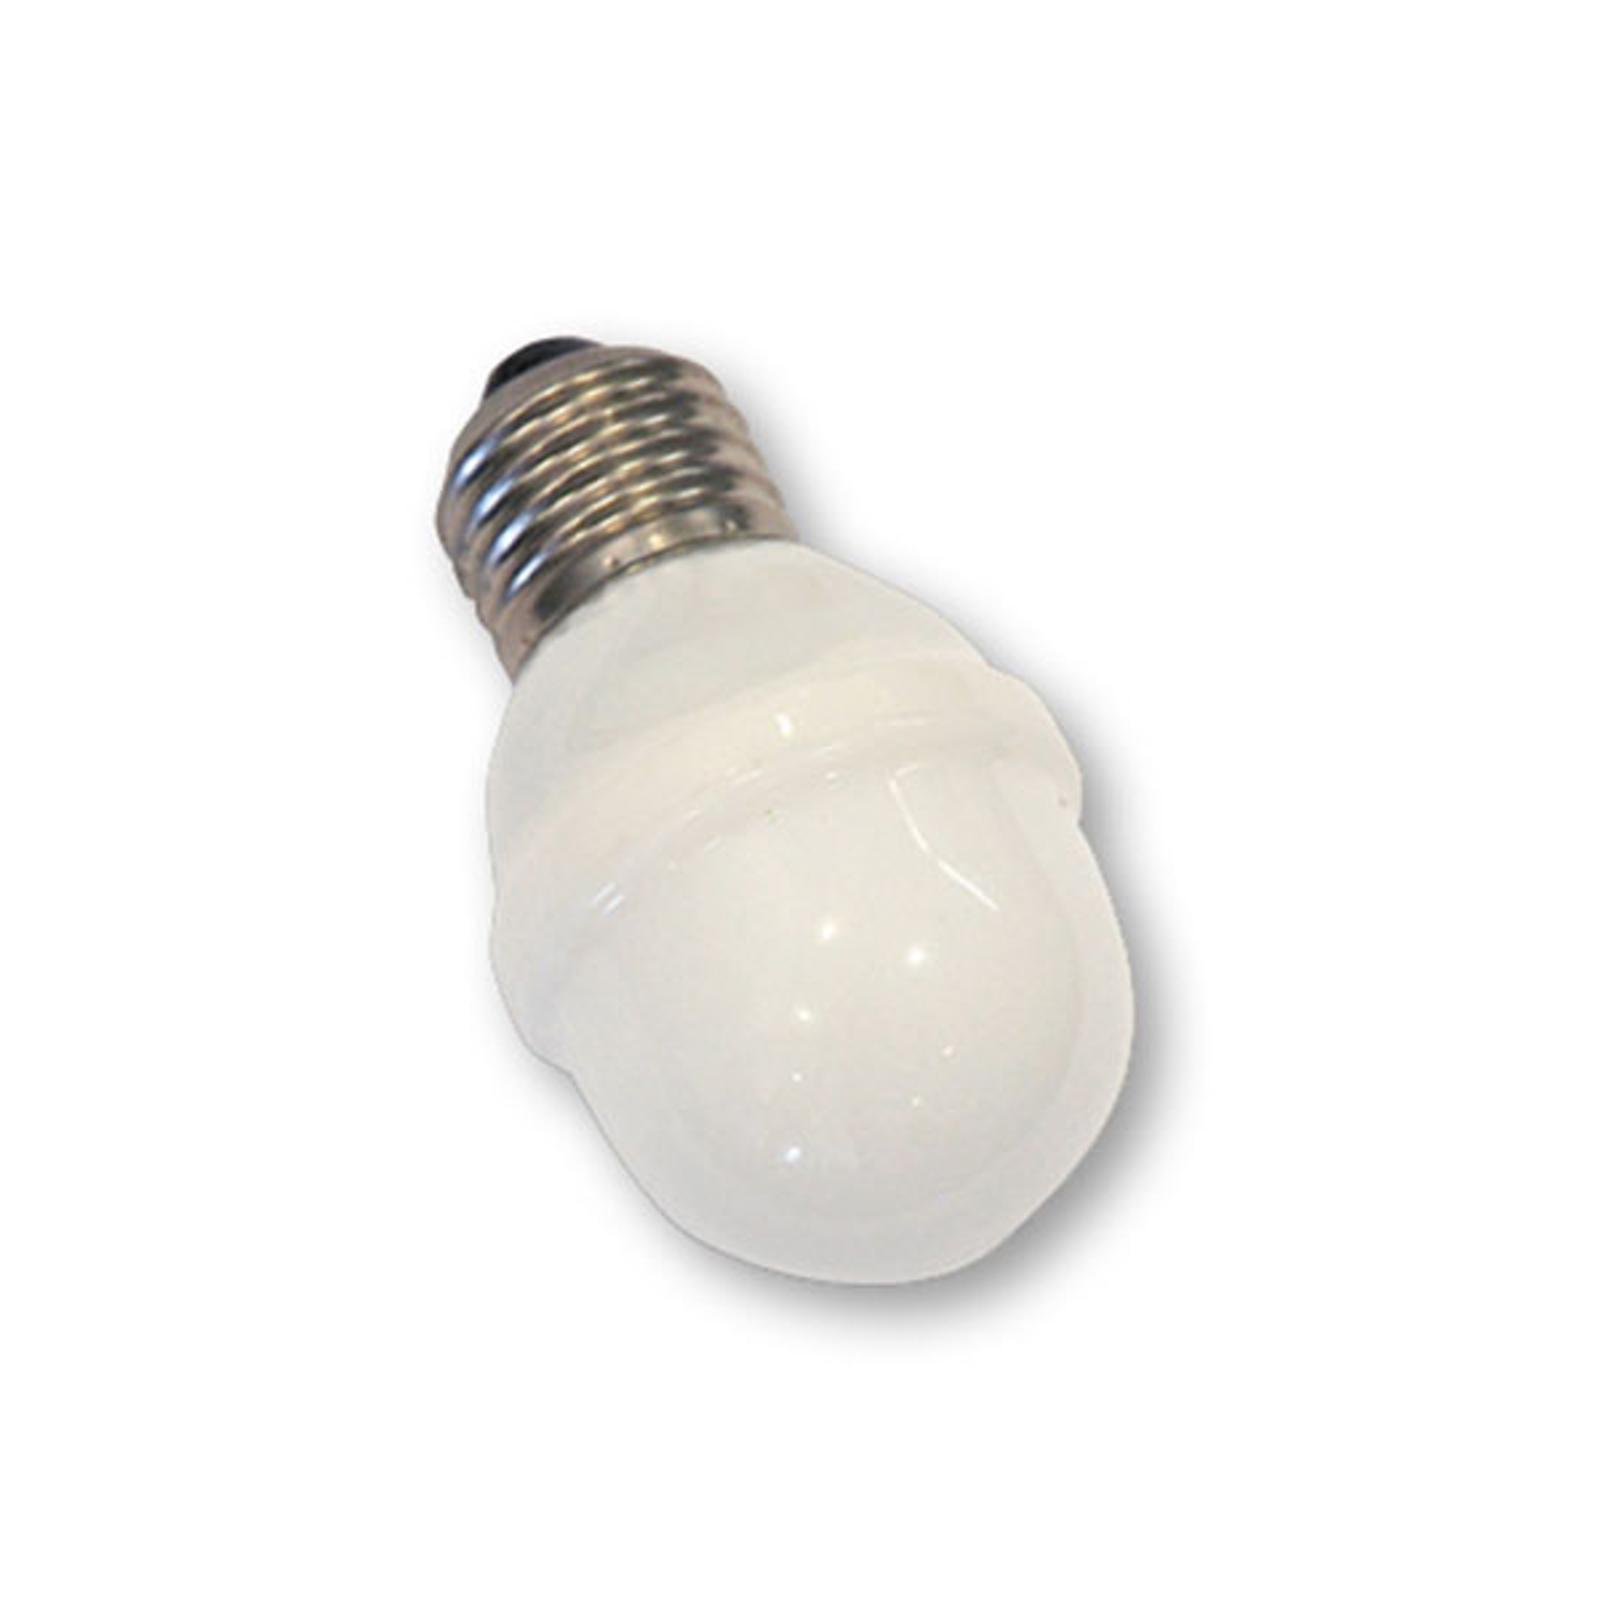 E27 Golfball-Lampe 1W 5,5 VA, warmweiß